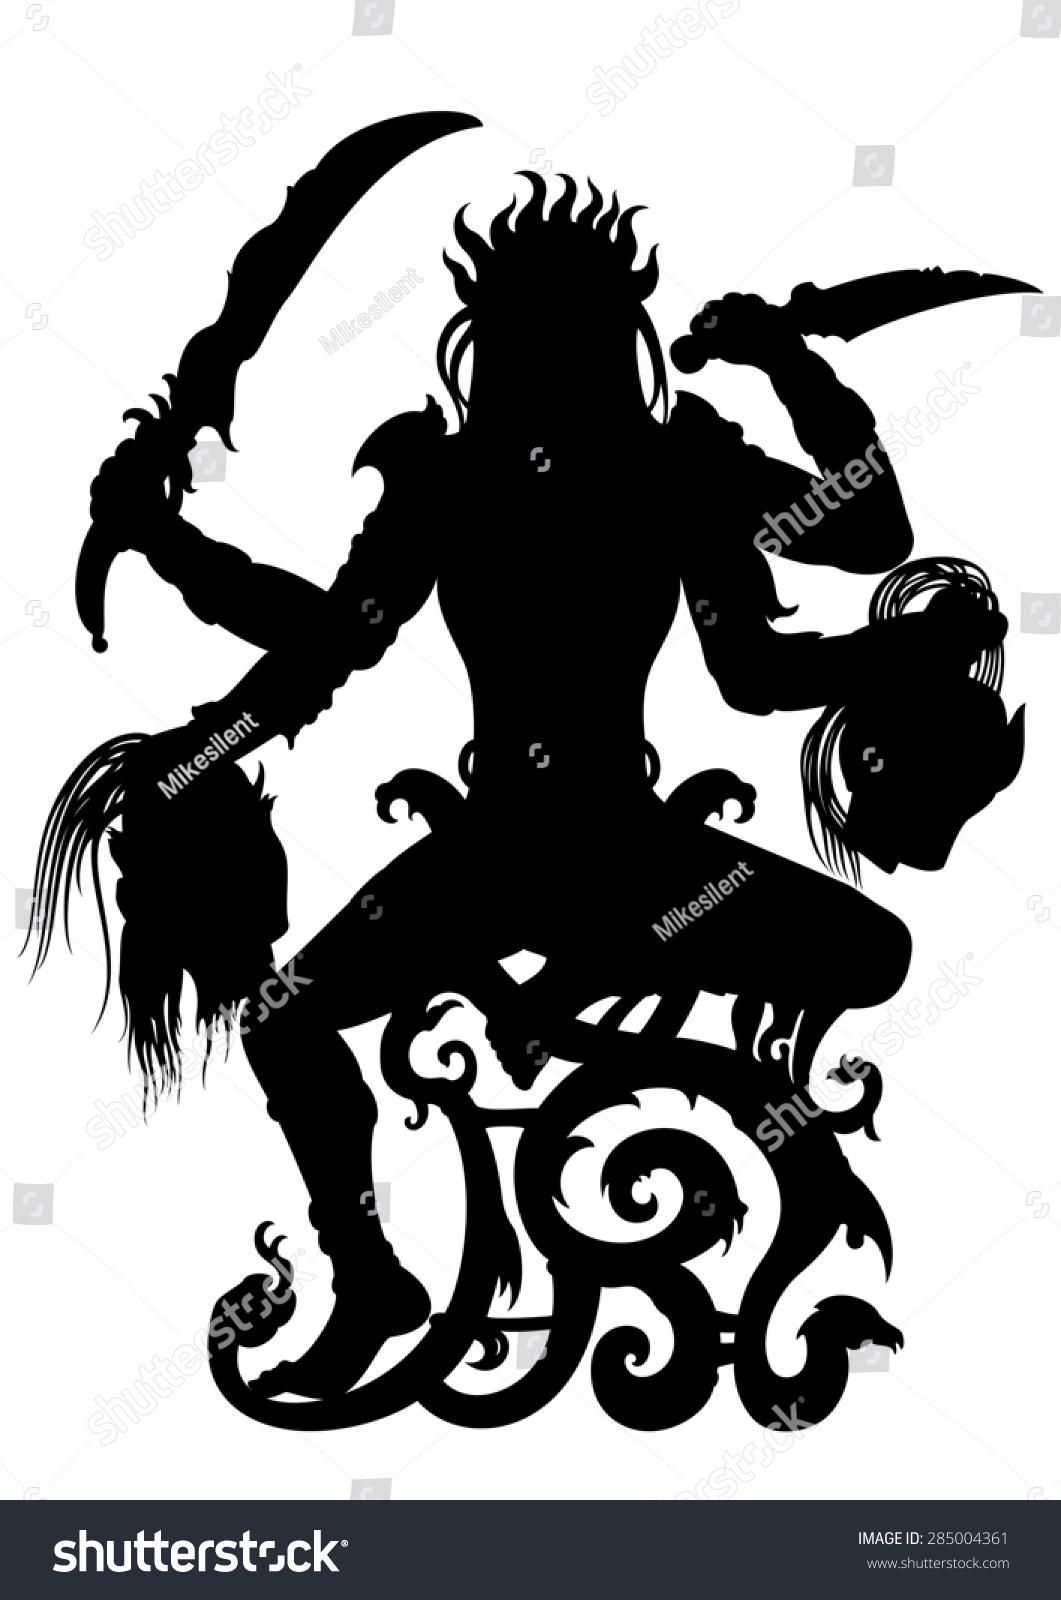 Kali Indian Goddess Silhouette Illustration Woman Stock